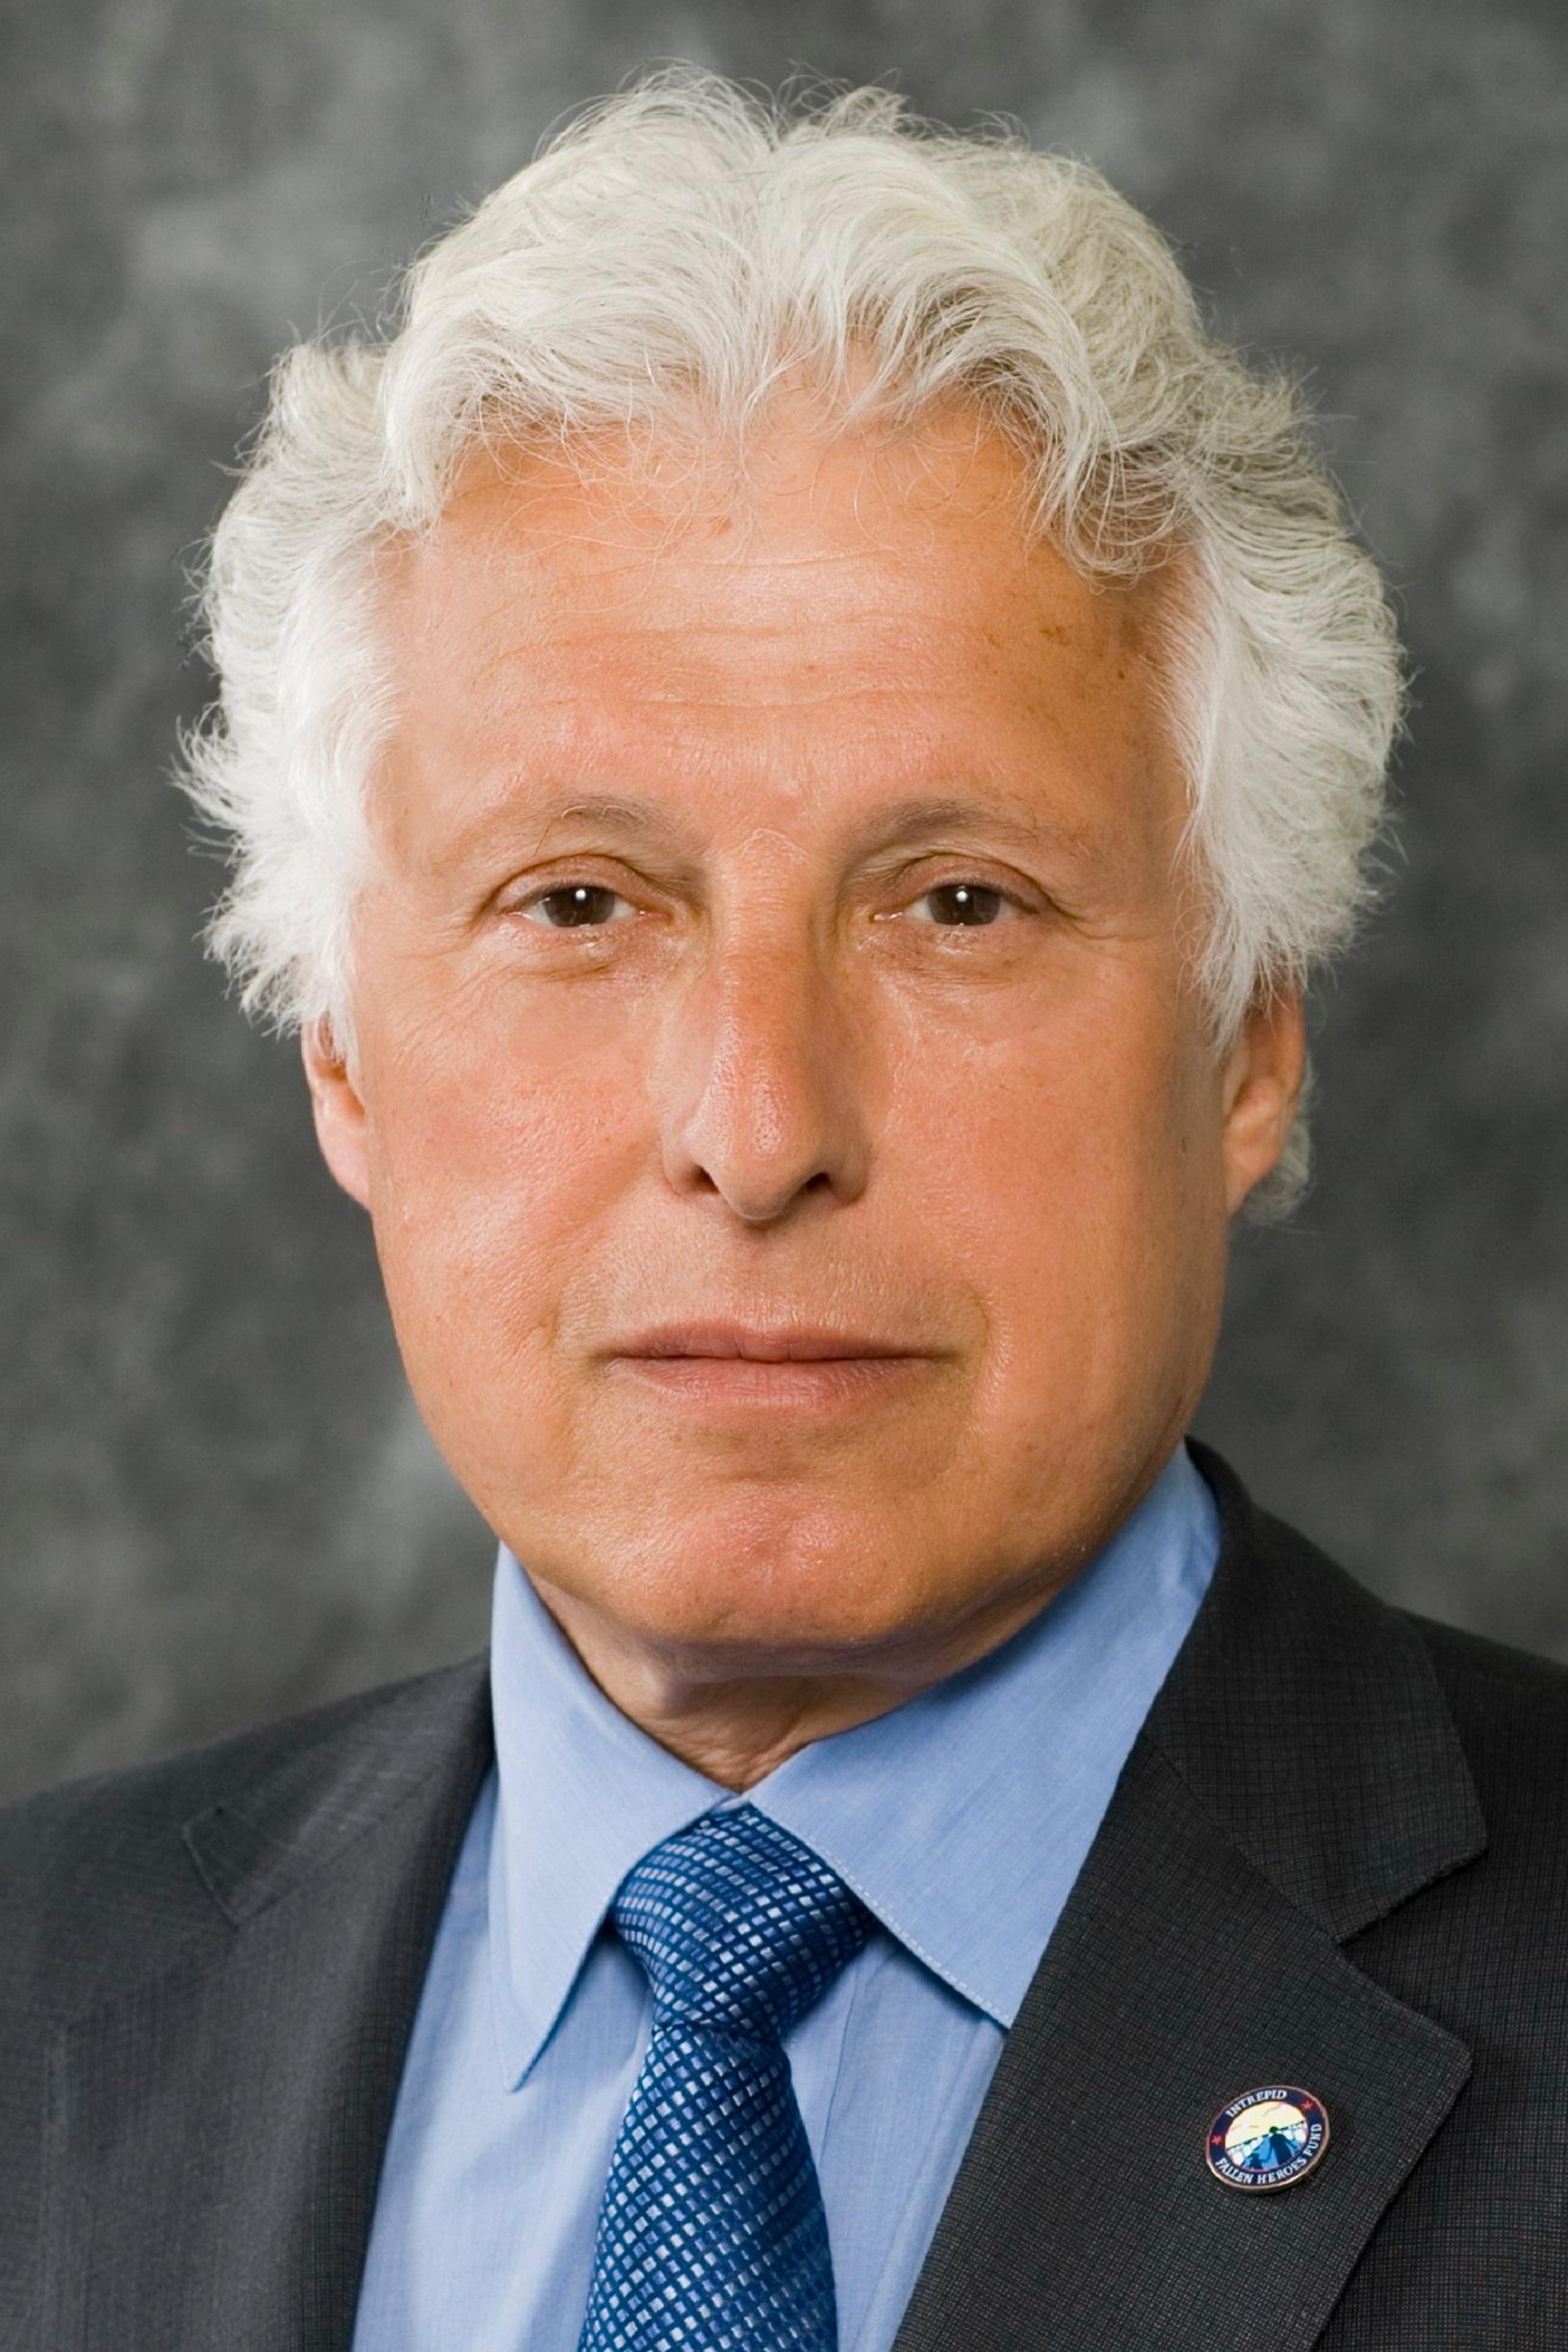 MARTIN L. EDELMAN   Paul Hastings LLP  Senior of Counsel